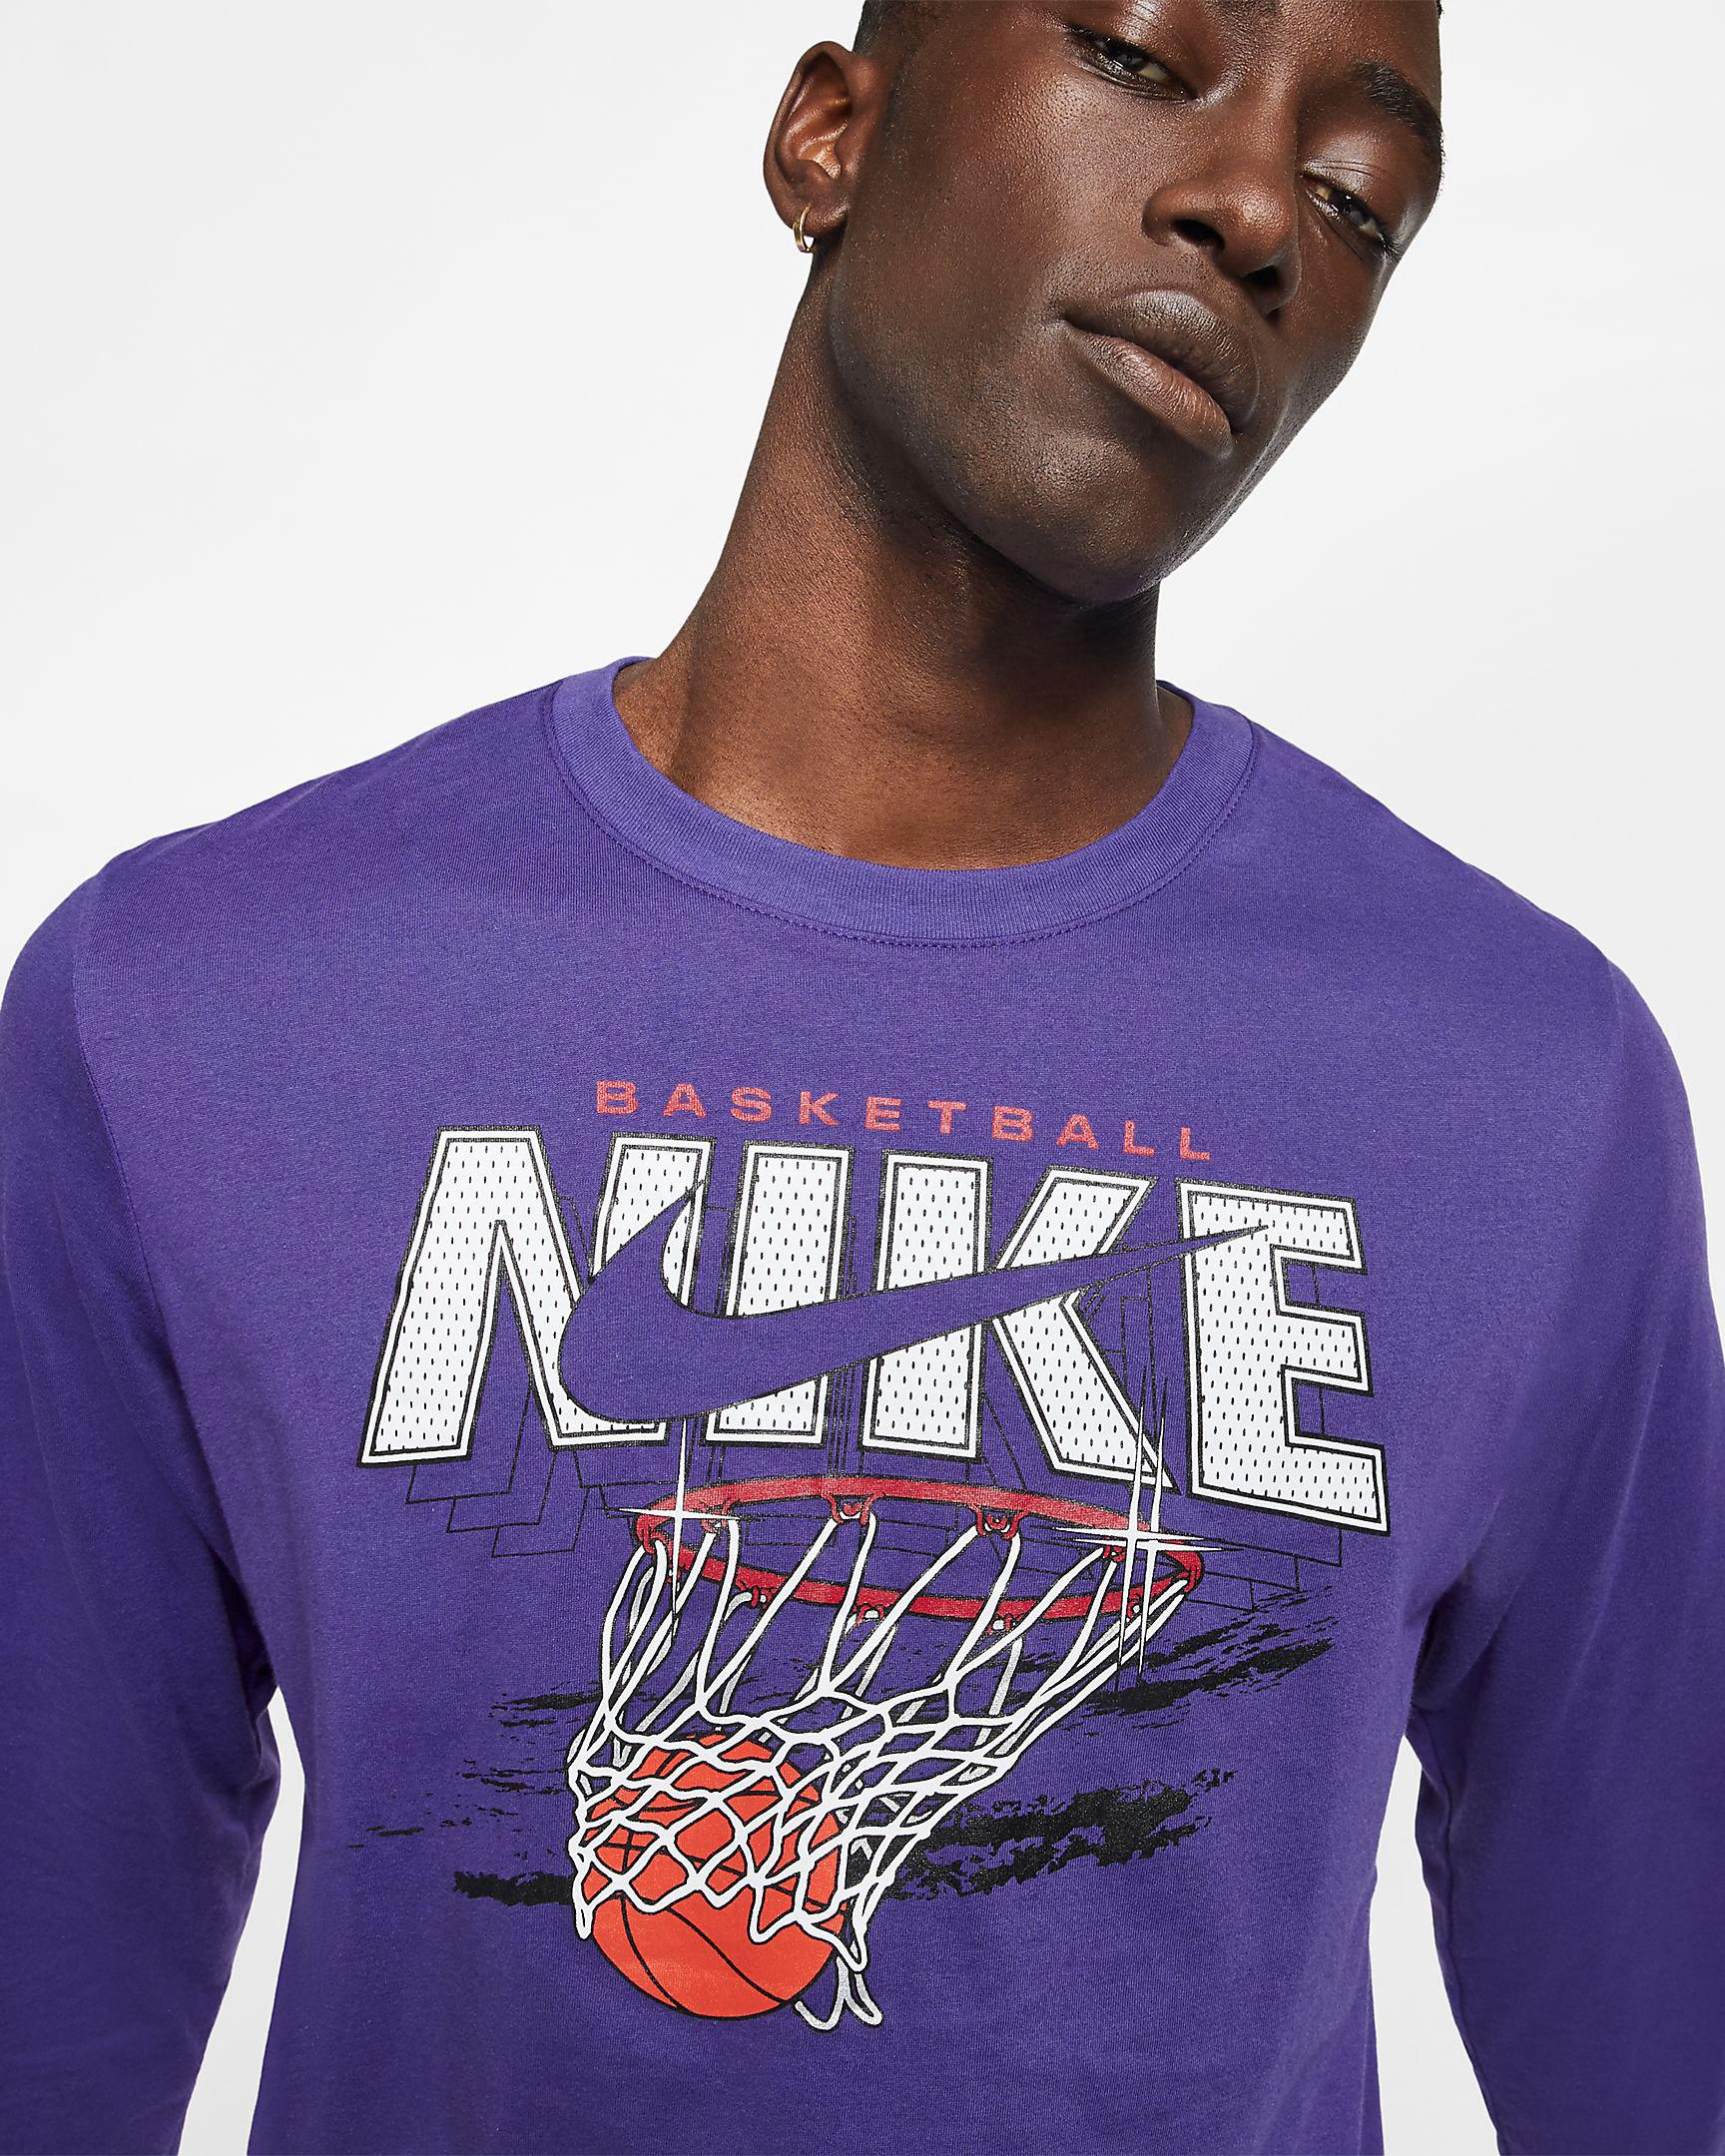 nike-basketball-swish-long-sleeve-shirt-purple